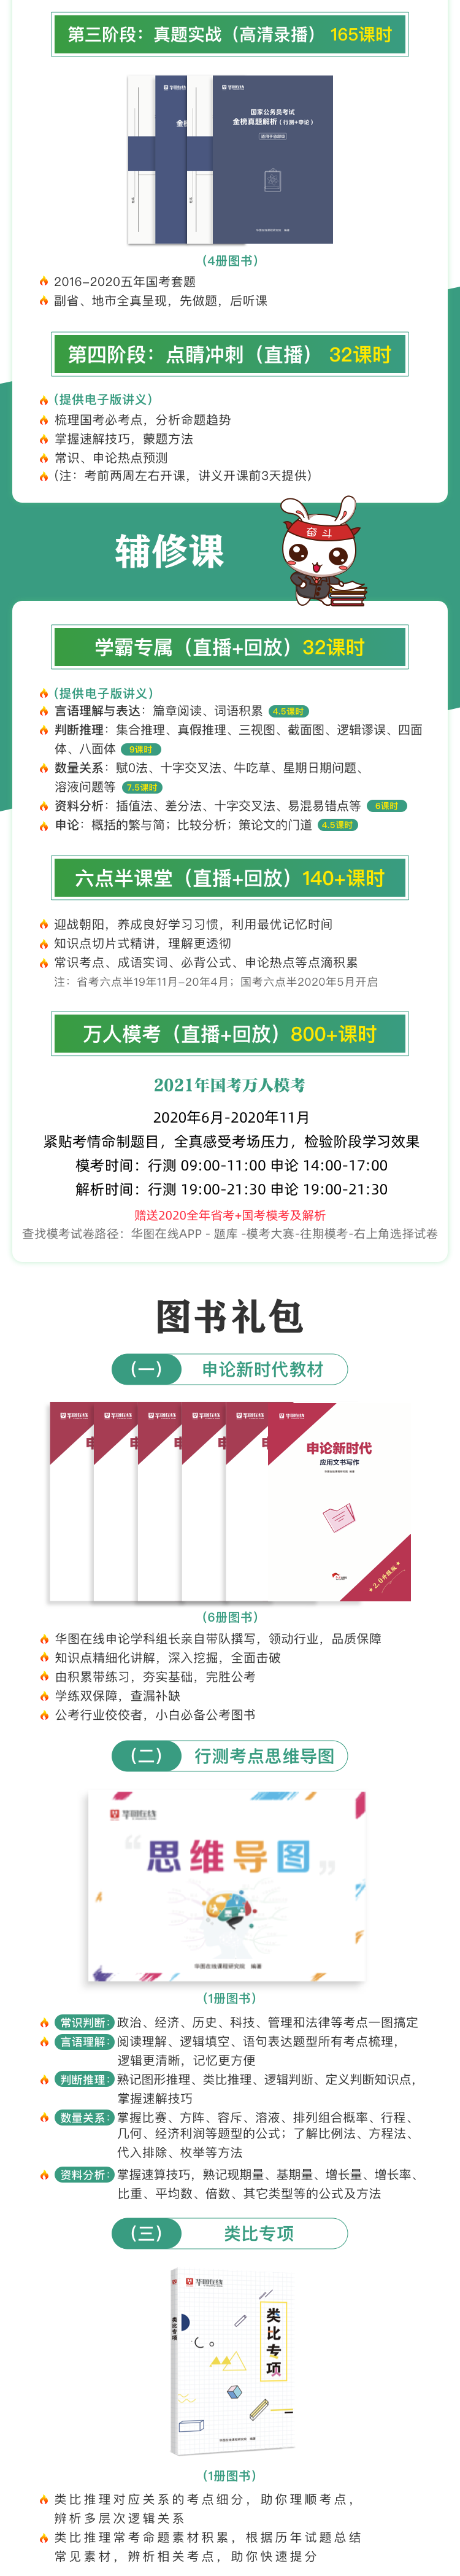 http://upload.htexam.com/userimg/2021国考系统提分班福利1.png